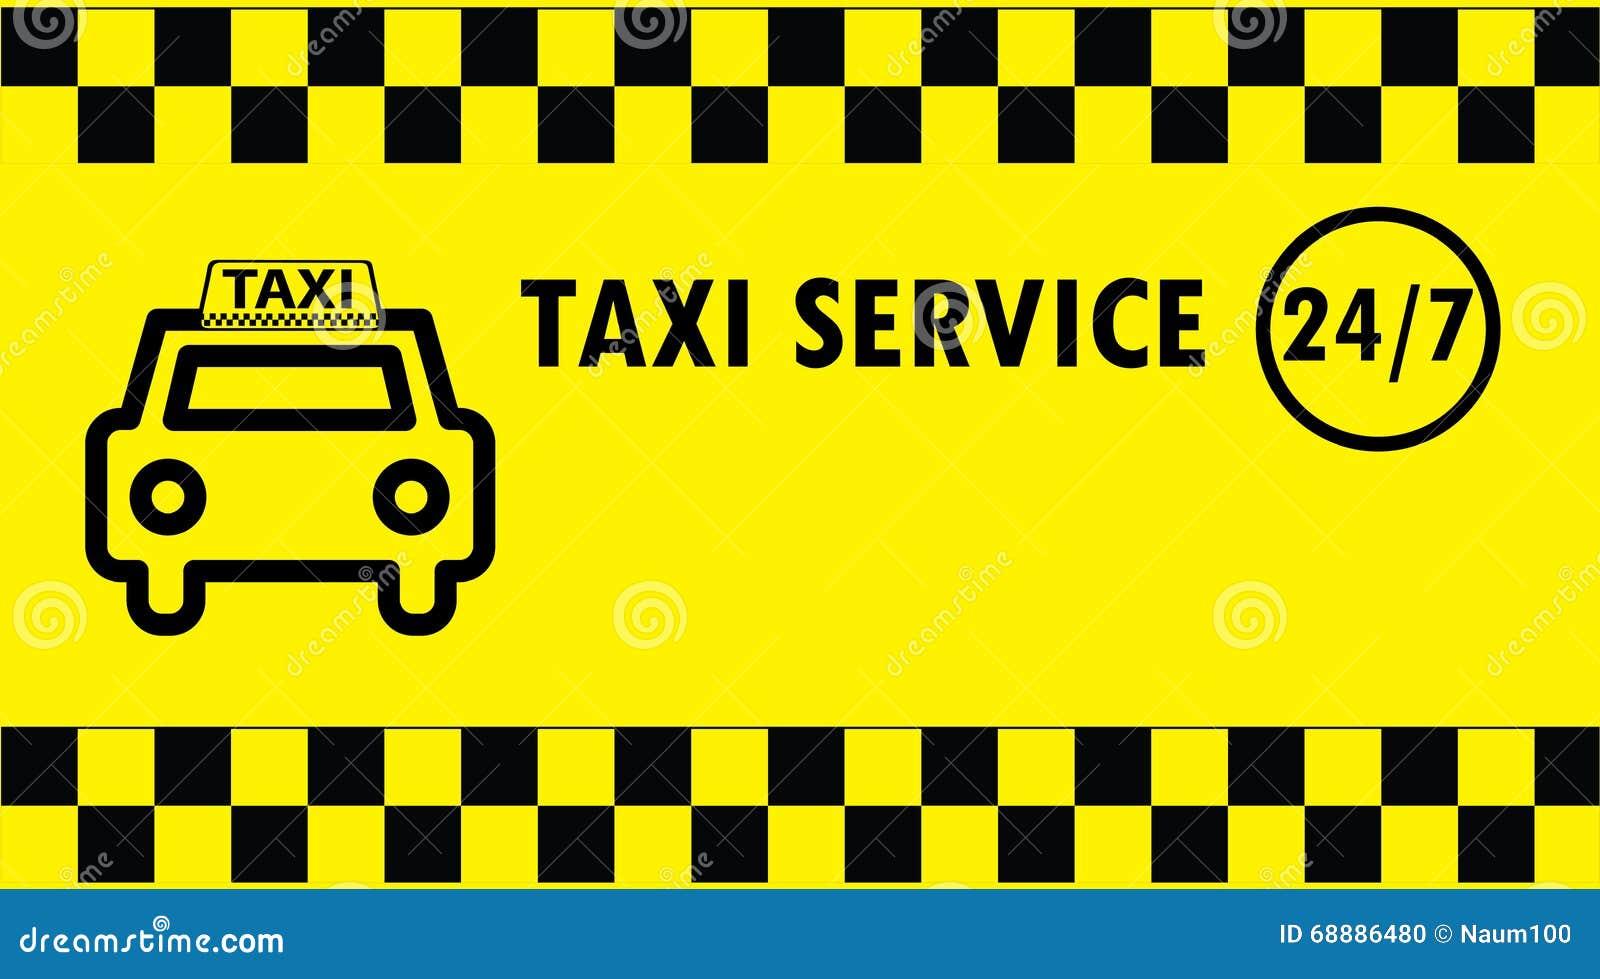 Taxi Business Card Illustration 68886480 - Megapixl